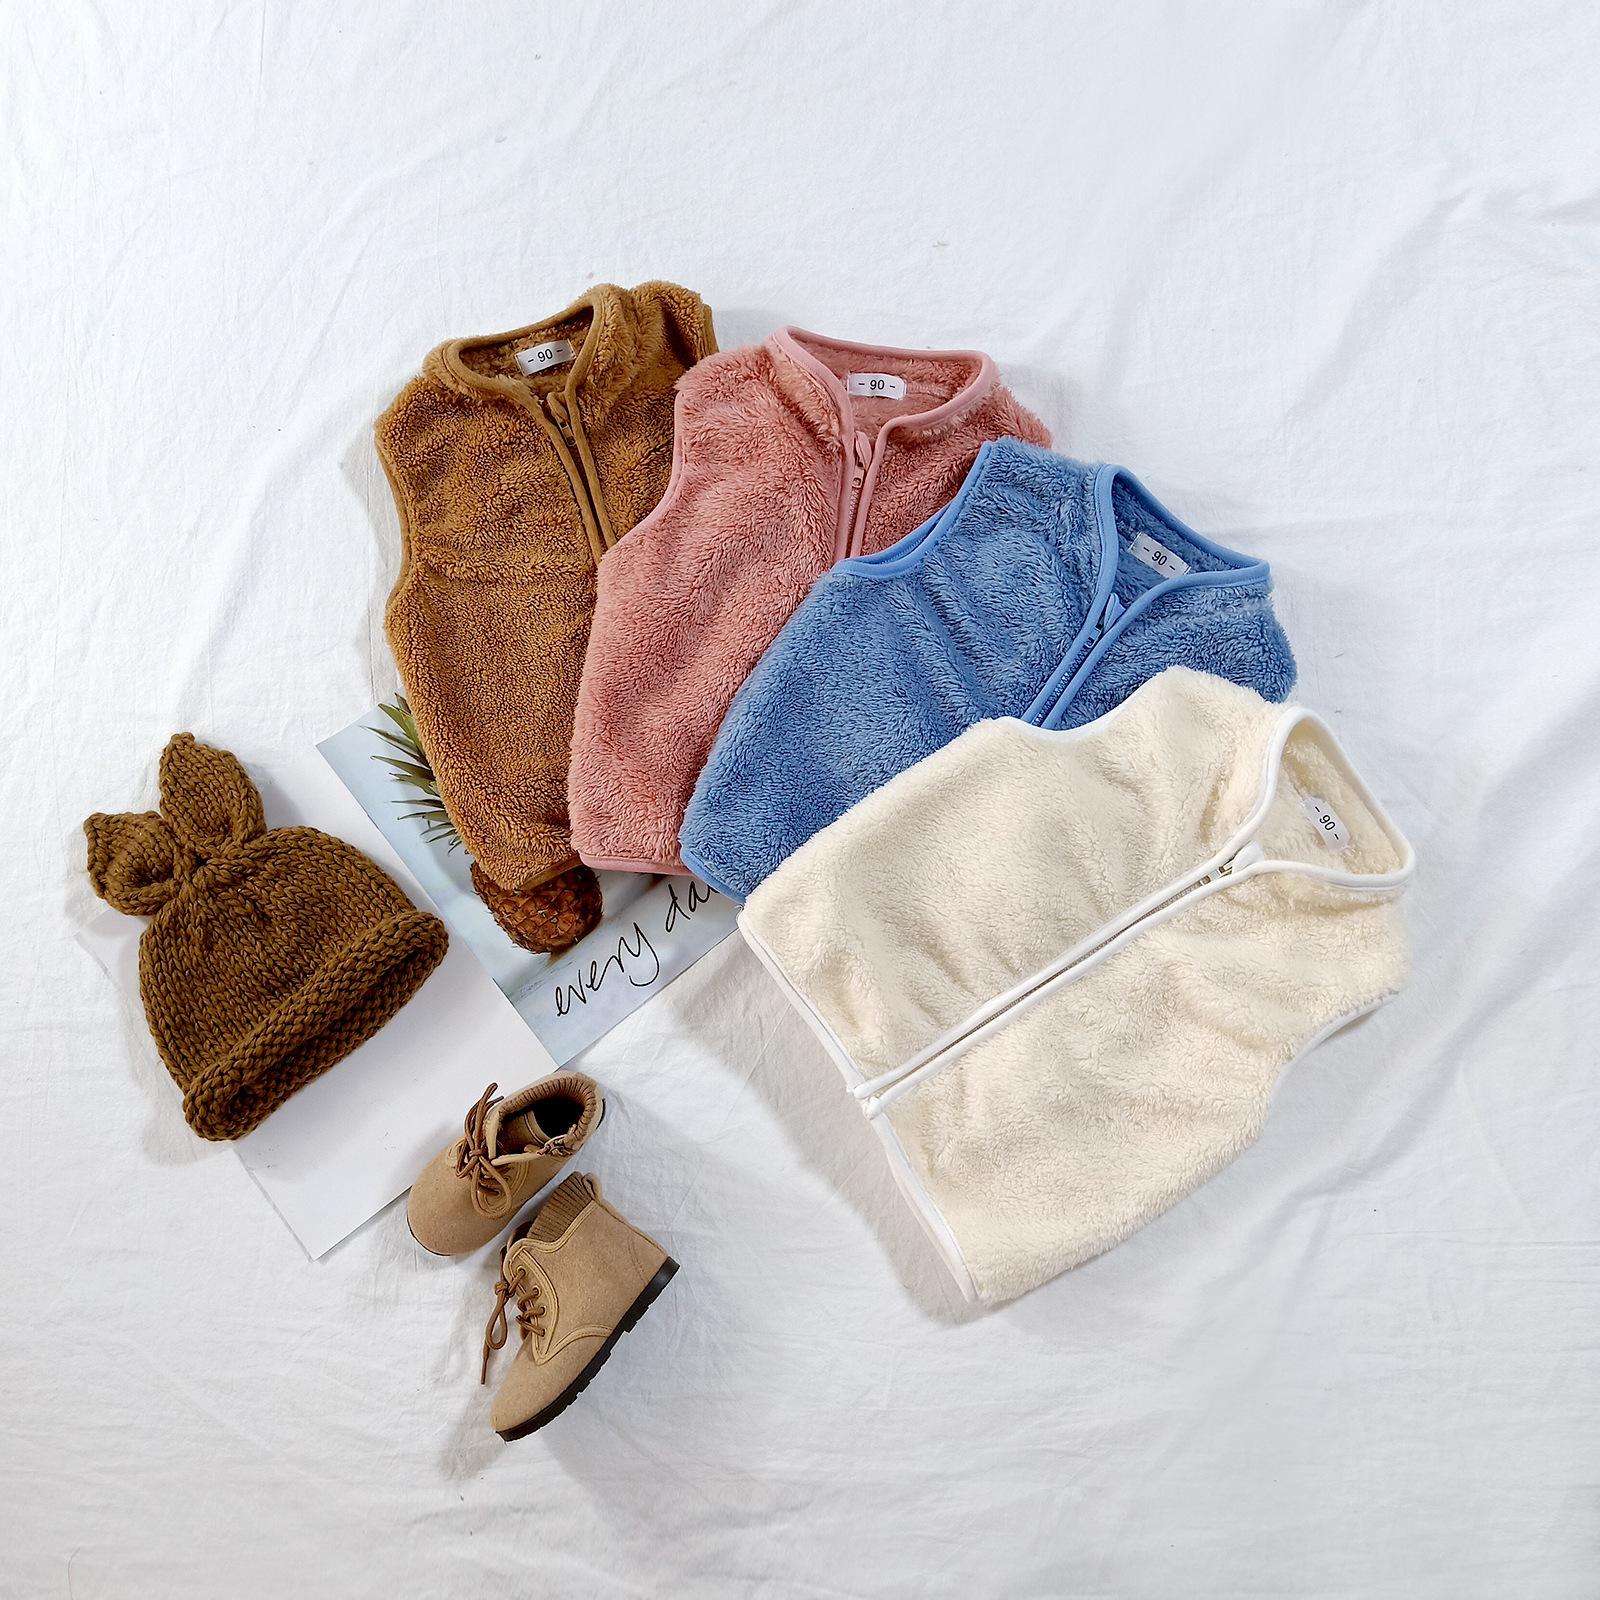 New Infant Winter Autumn Velvet Jackets Toddler Warm Waistcoat Coat Clothes Kids Clothing Baby Girl Boy Clothes Baby Fur Vest